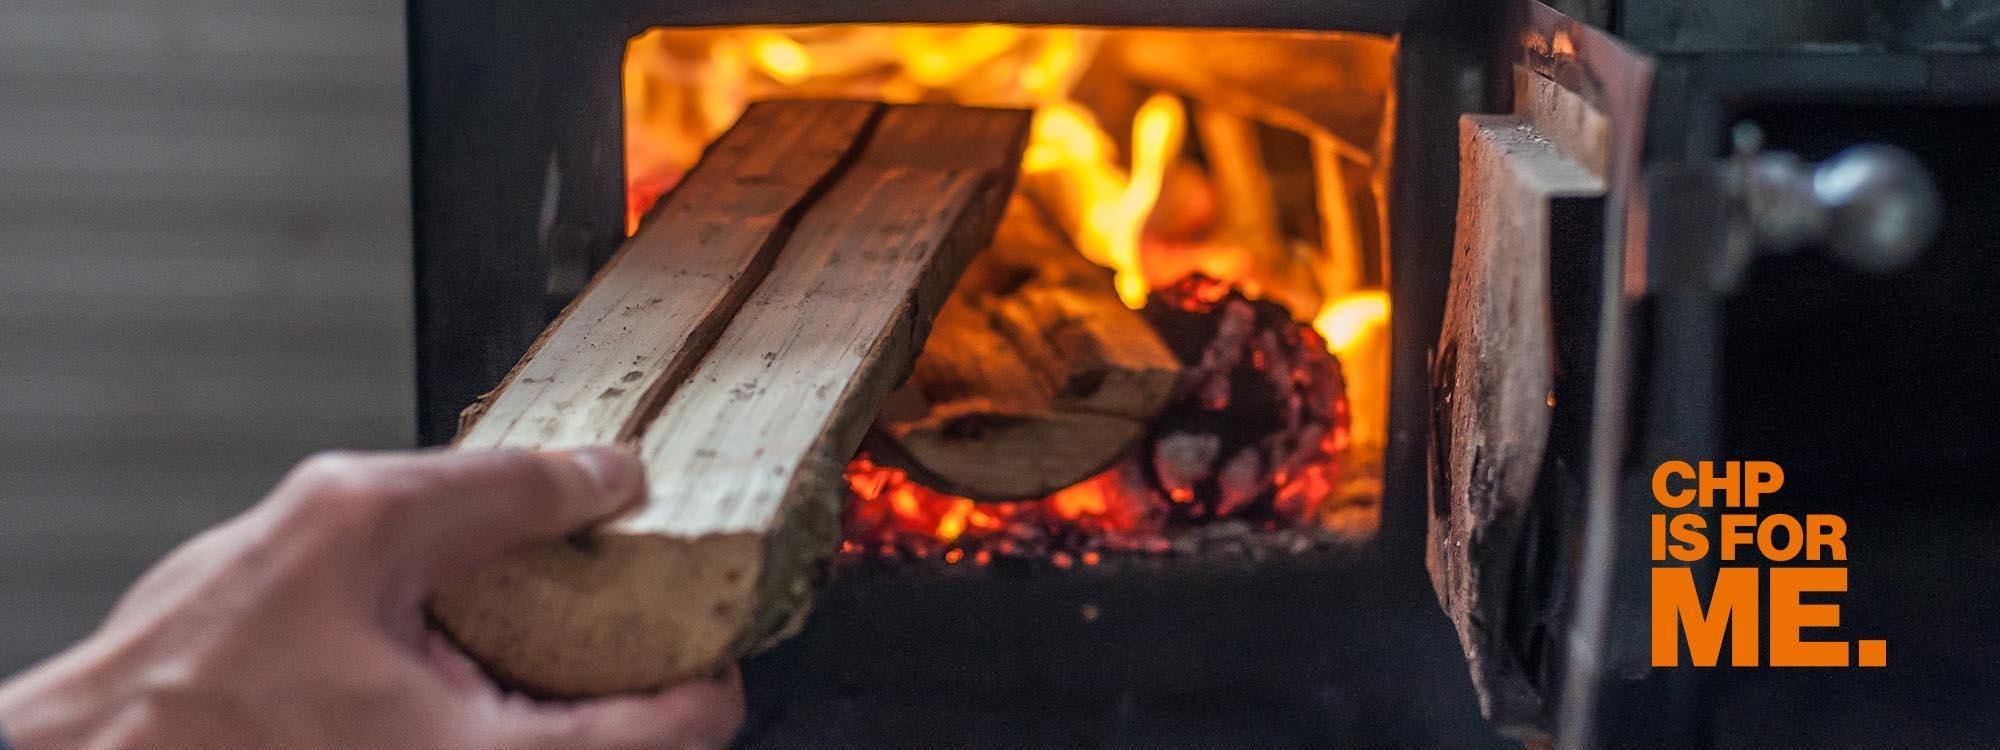 CHP wood burners 2 c